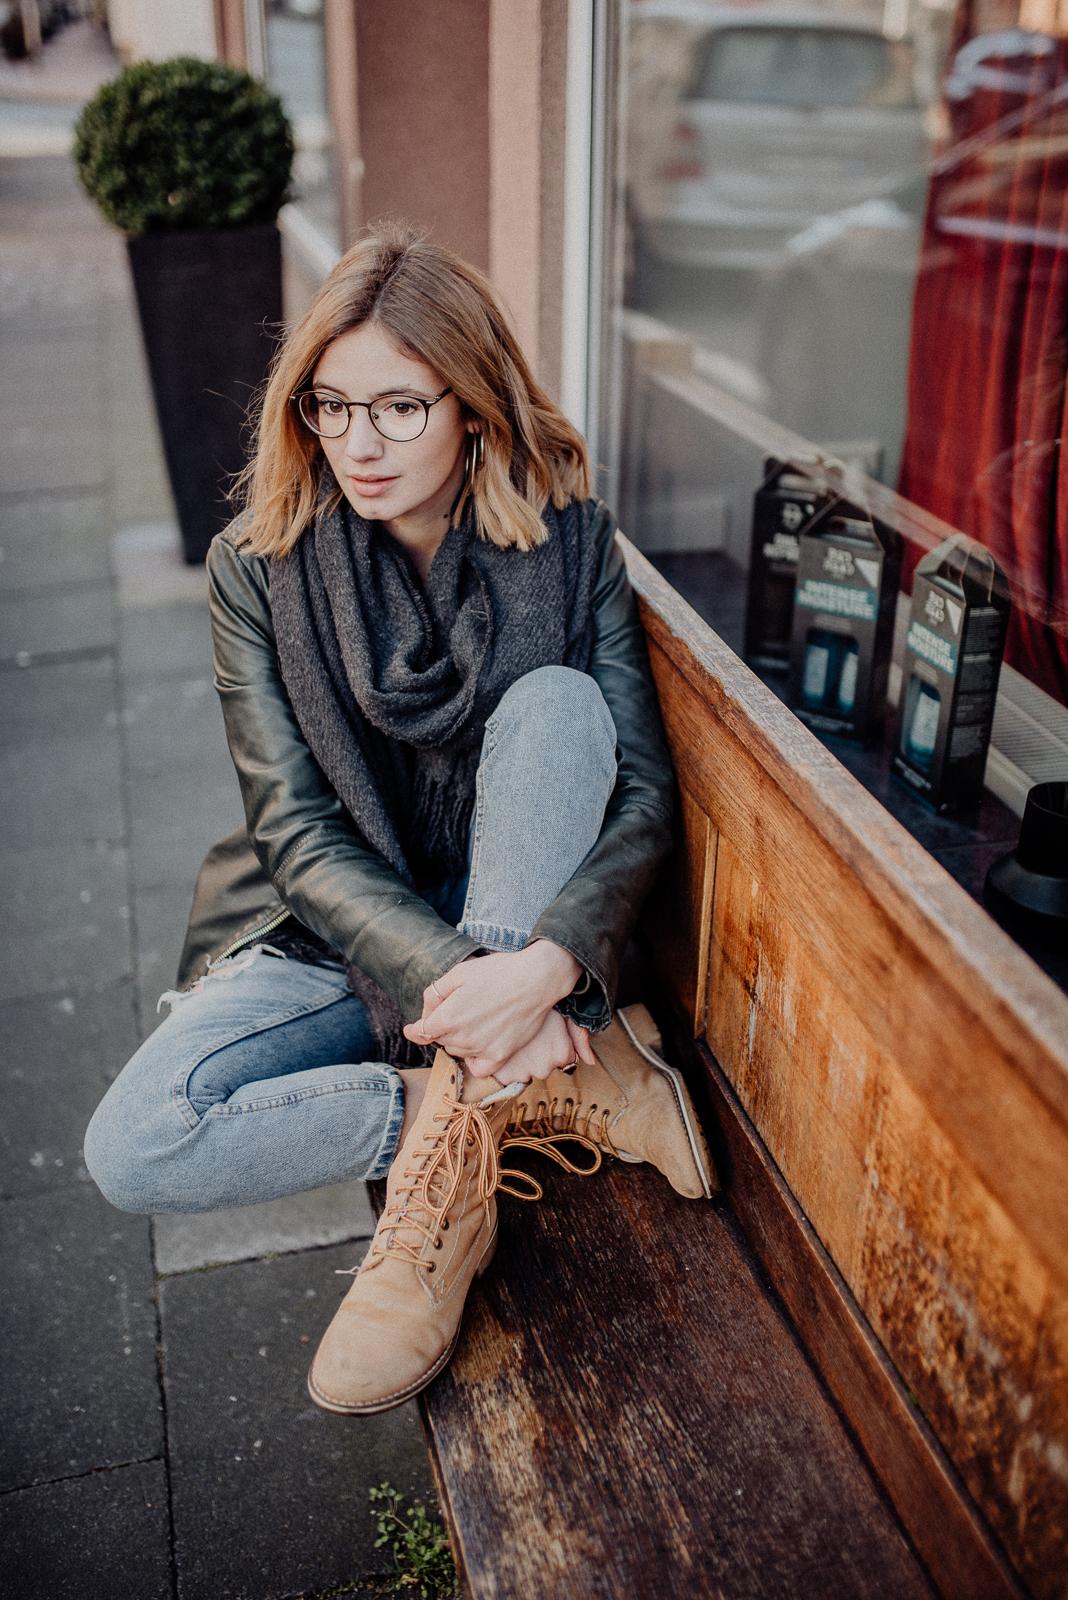 025-designparaplus-fotografin-witten-portrait-shooting-downtown